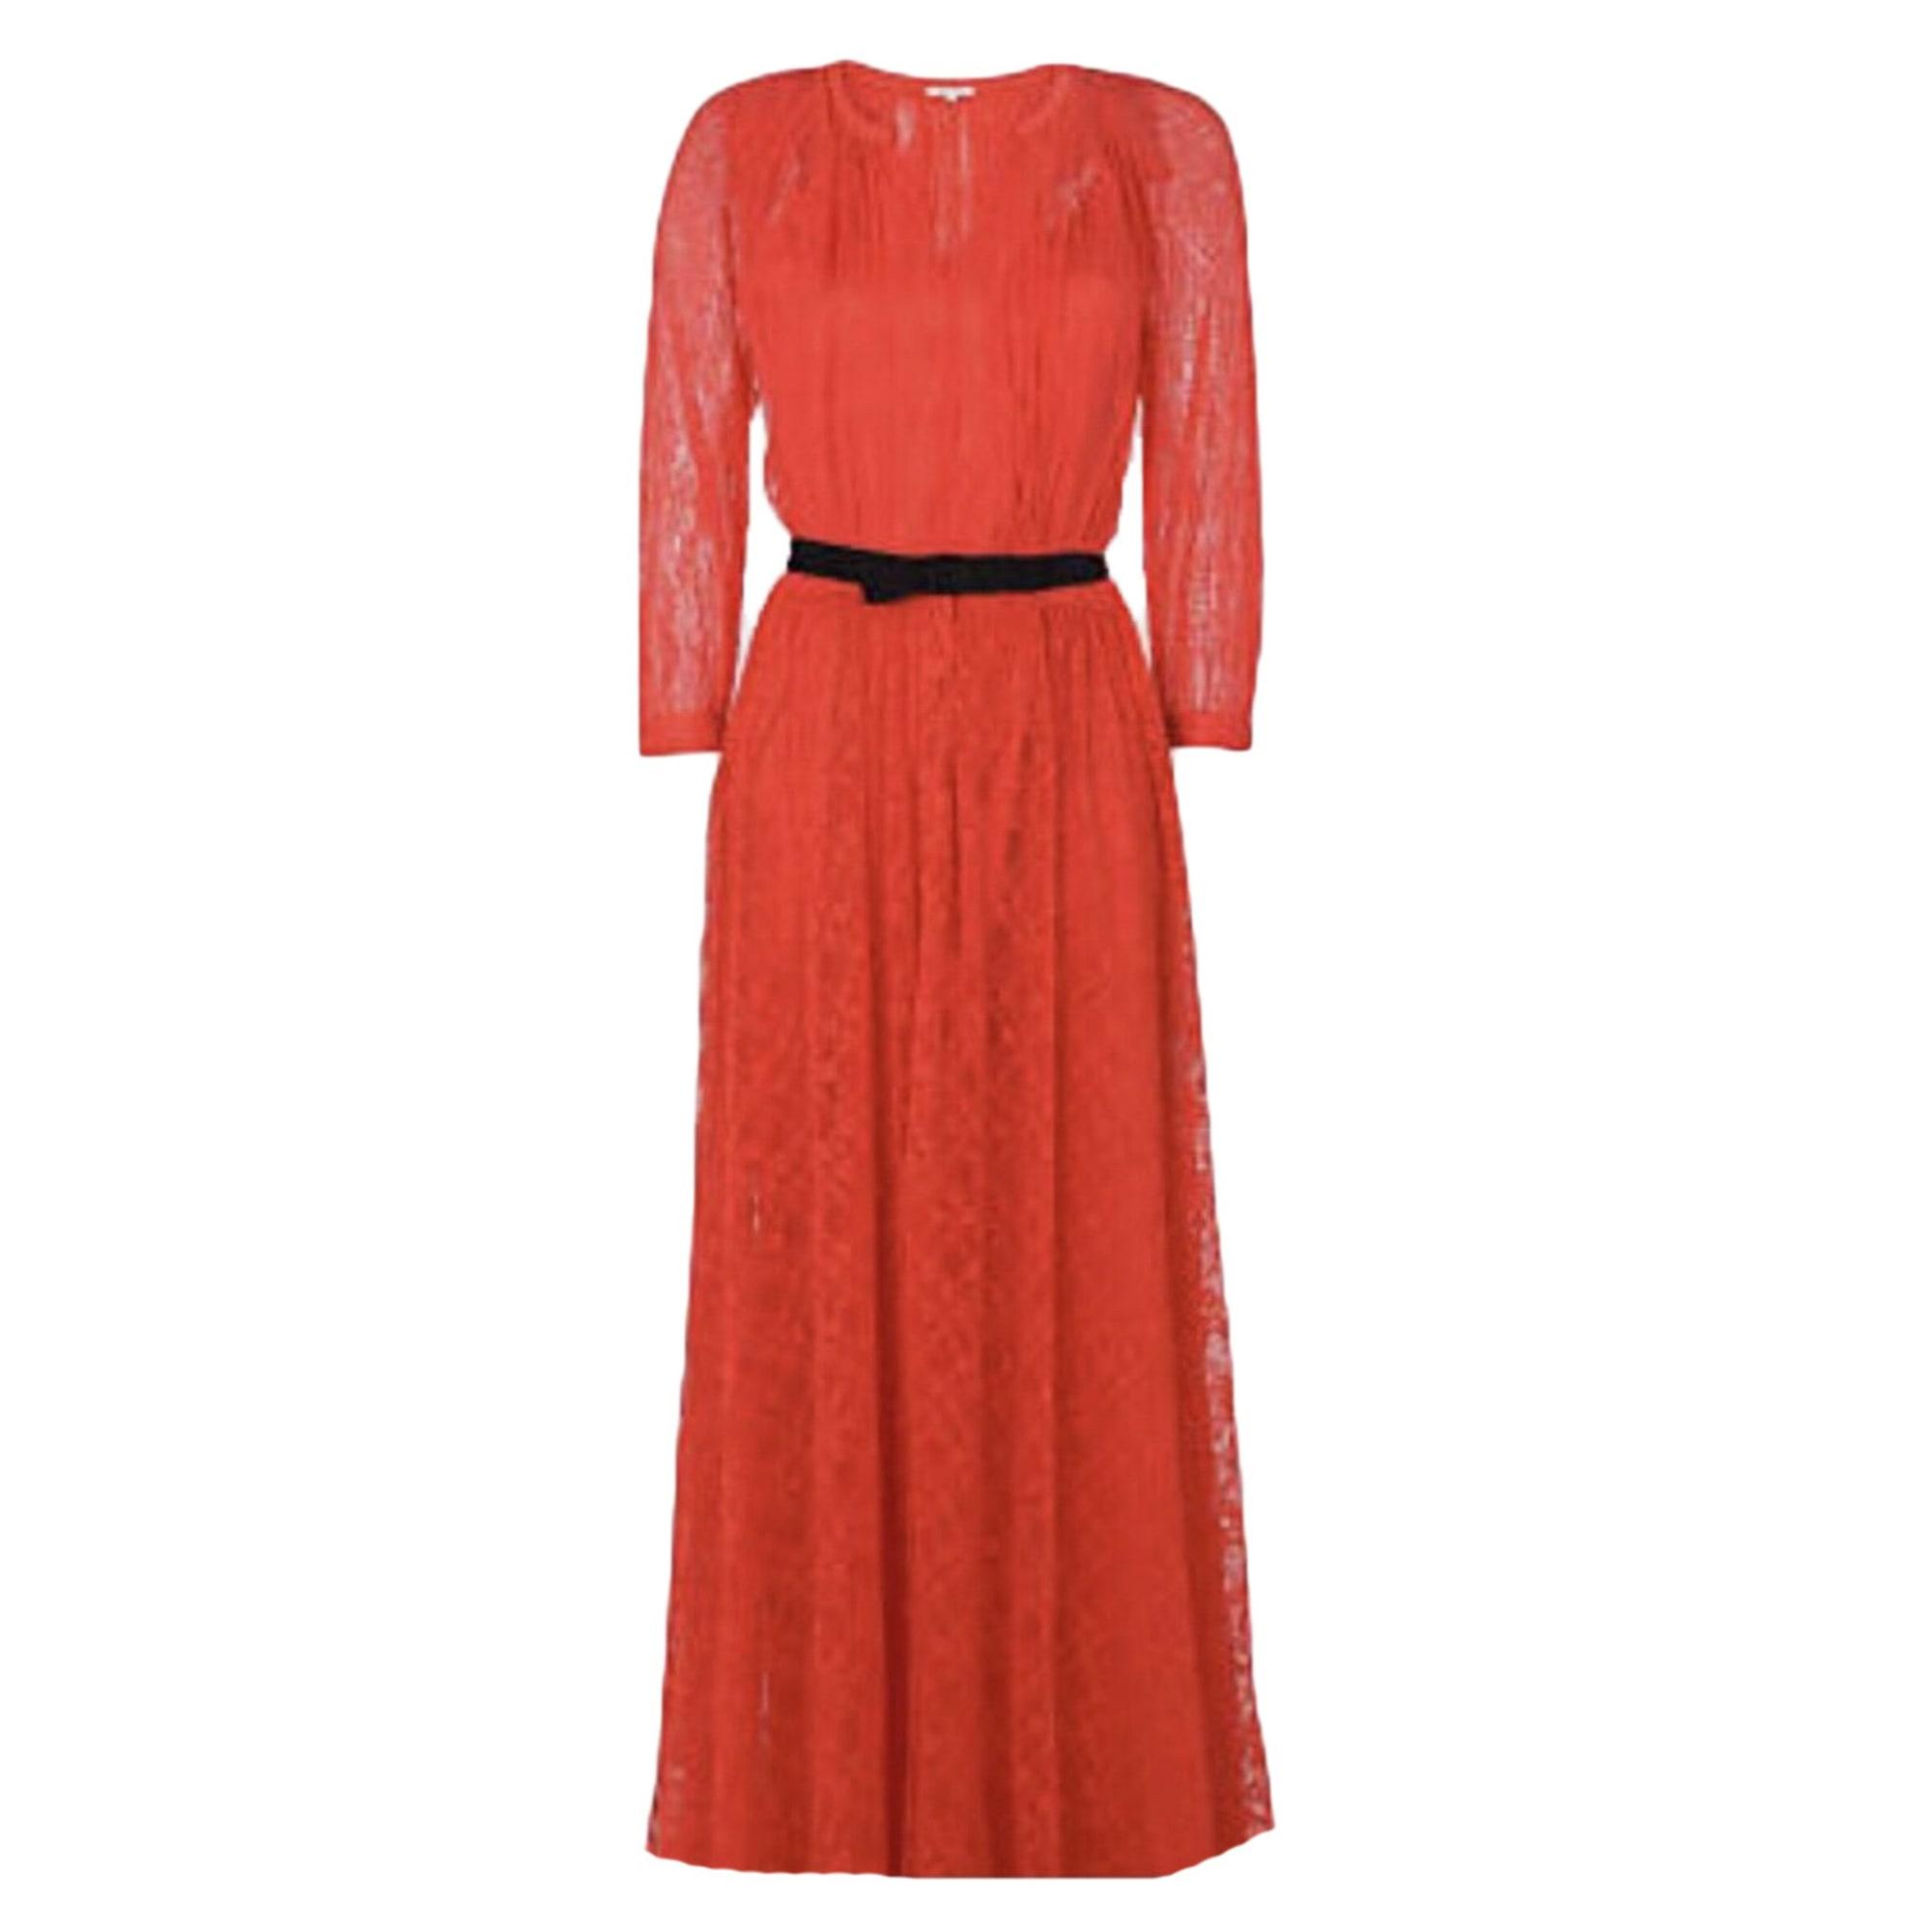 165434ed226 Robe longue MANOUSH Rouge corail